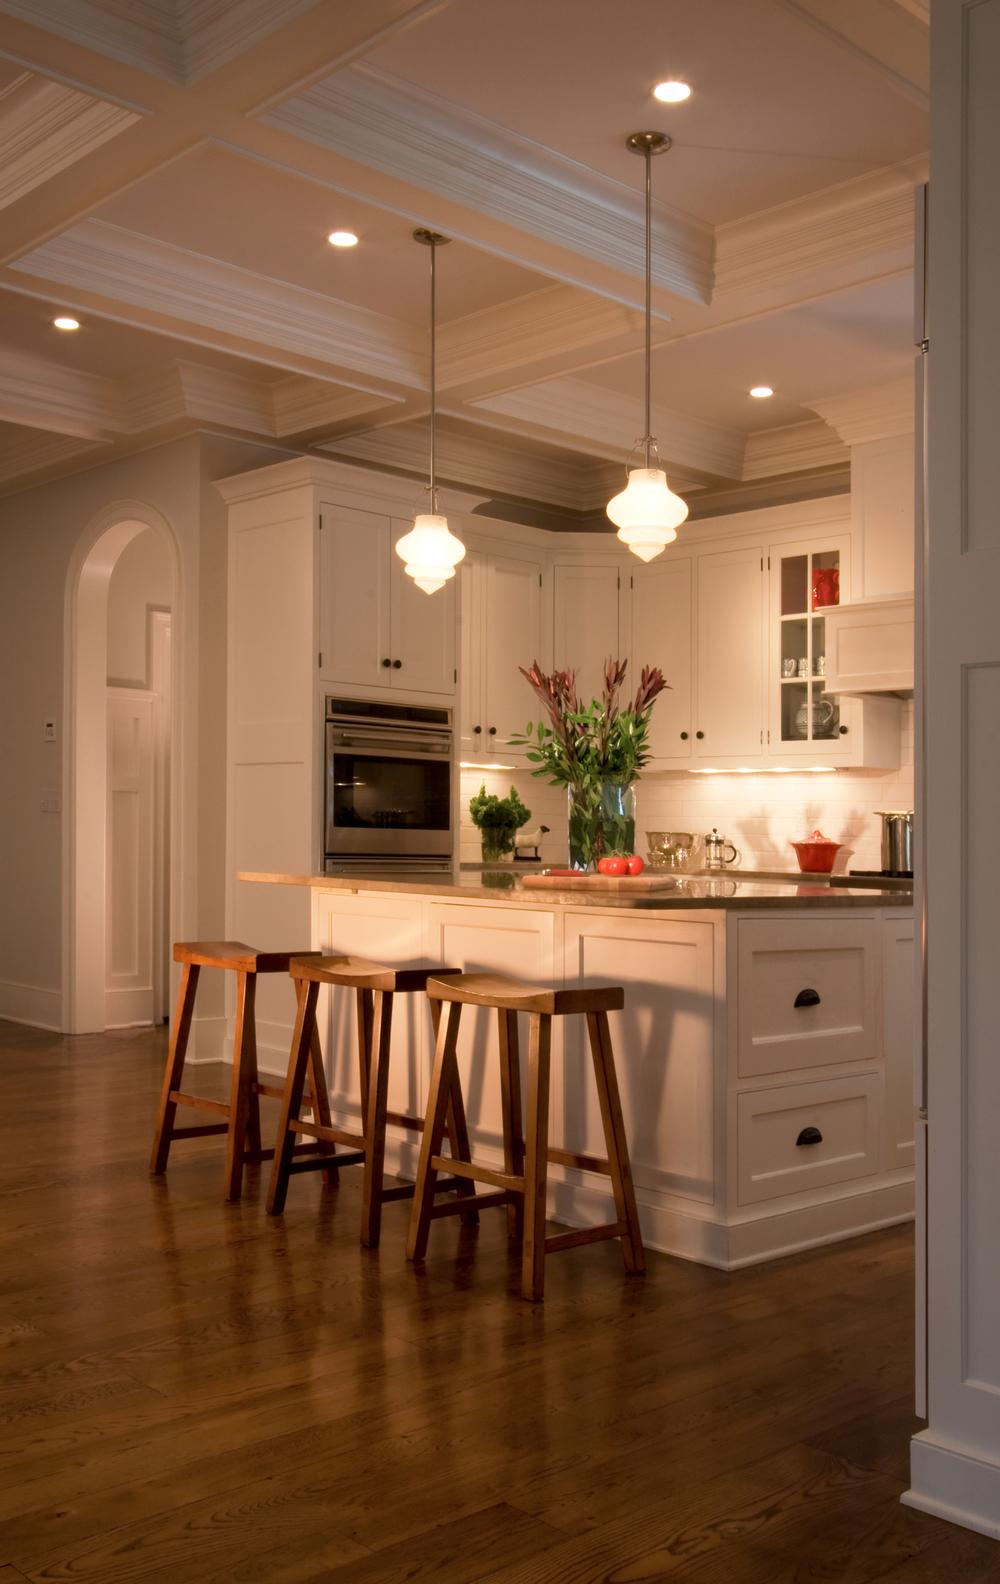 14-kitchen_vert_2174_v2f-cc.jpg